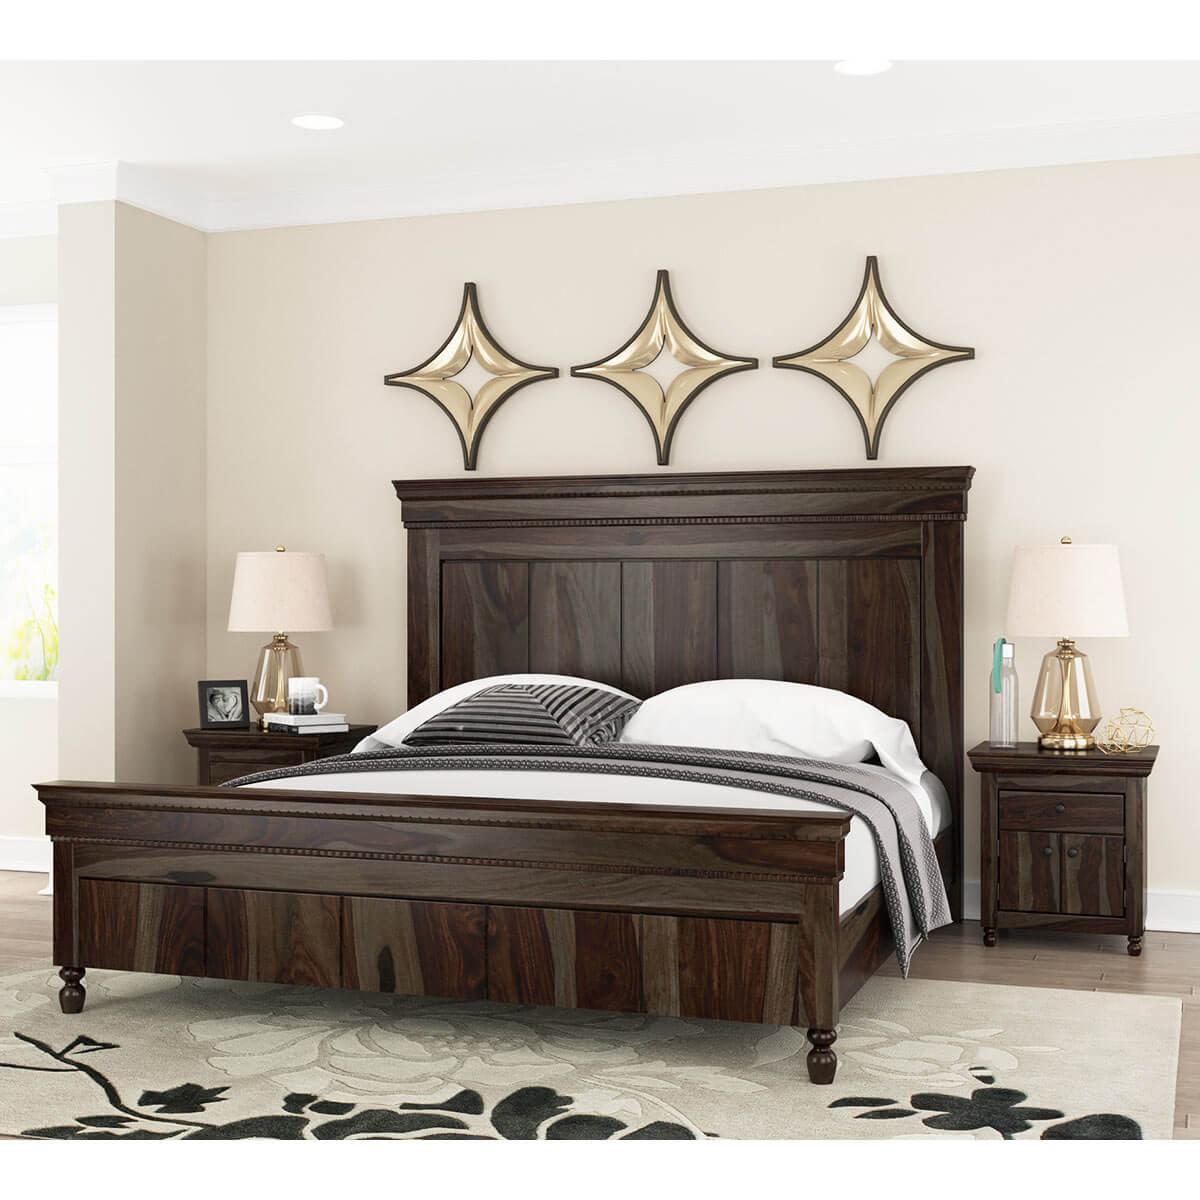 modern rustic solid wood bed frame w headboard footboard. rustic solid wood bed frame w headboard footboard